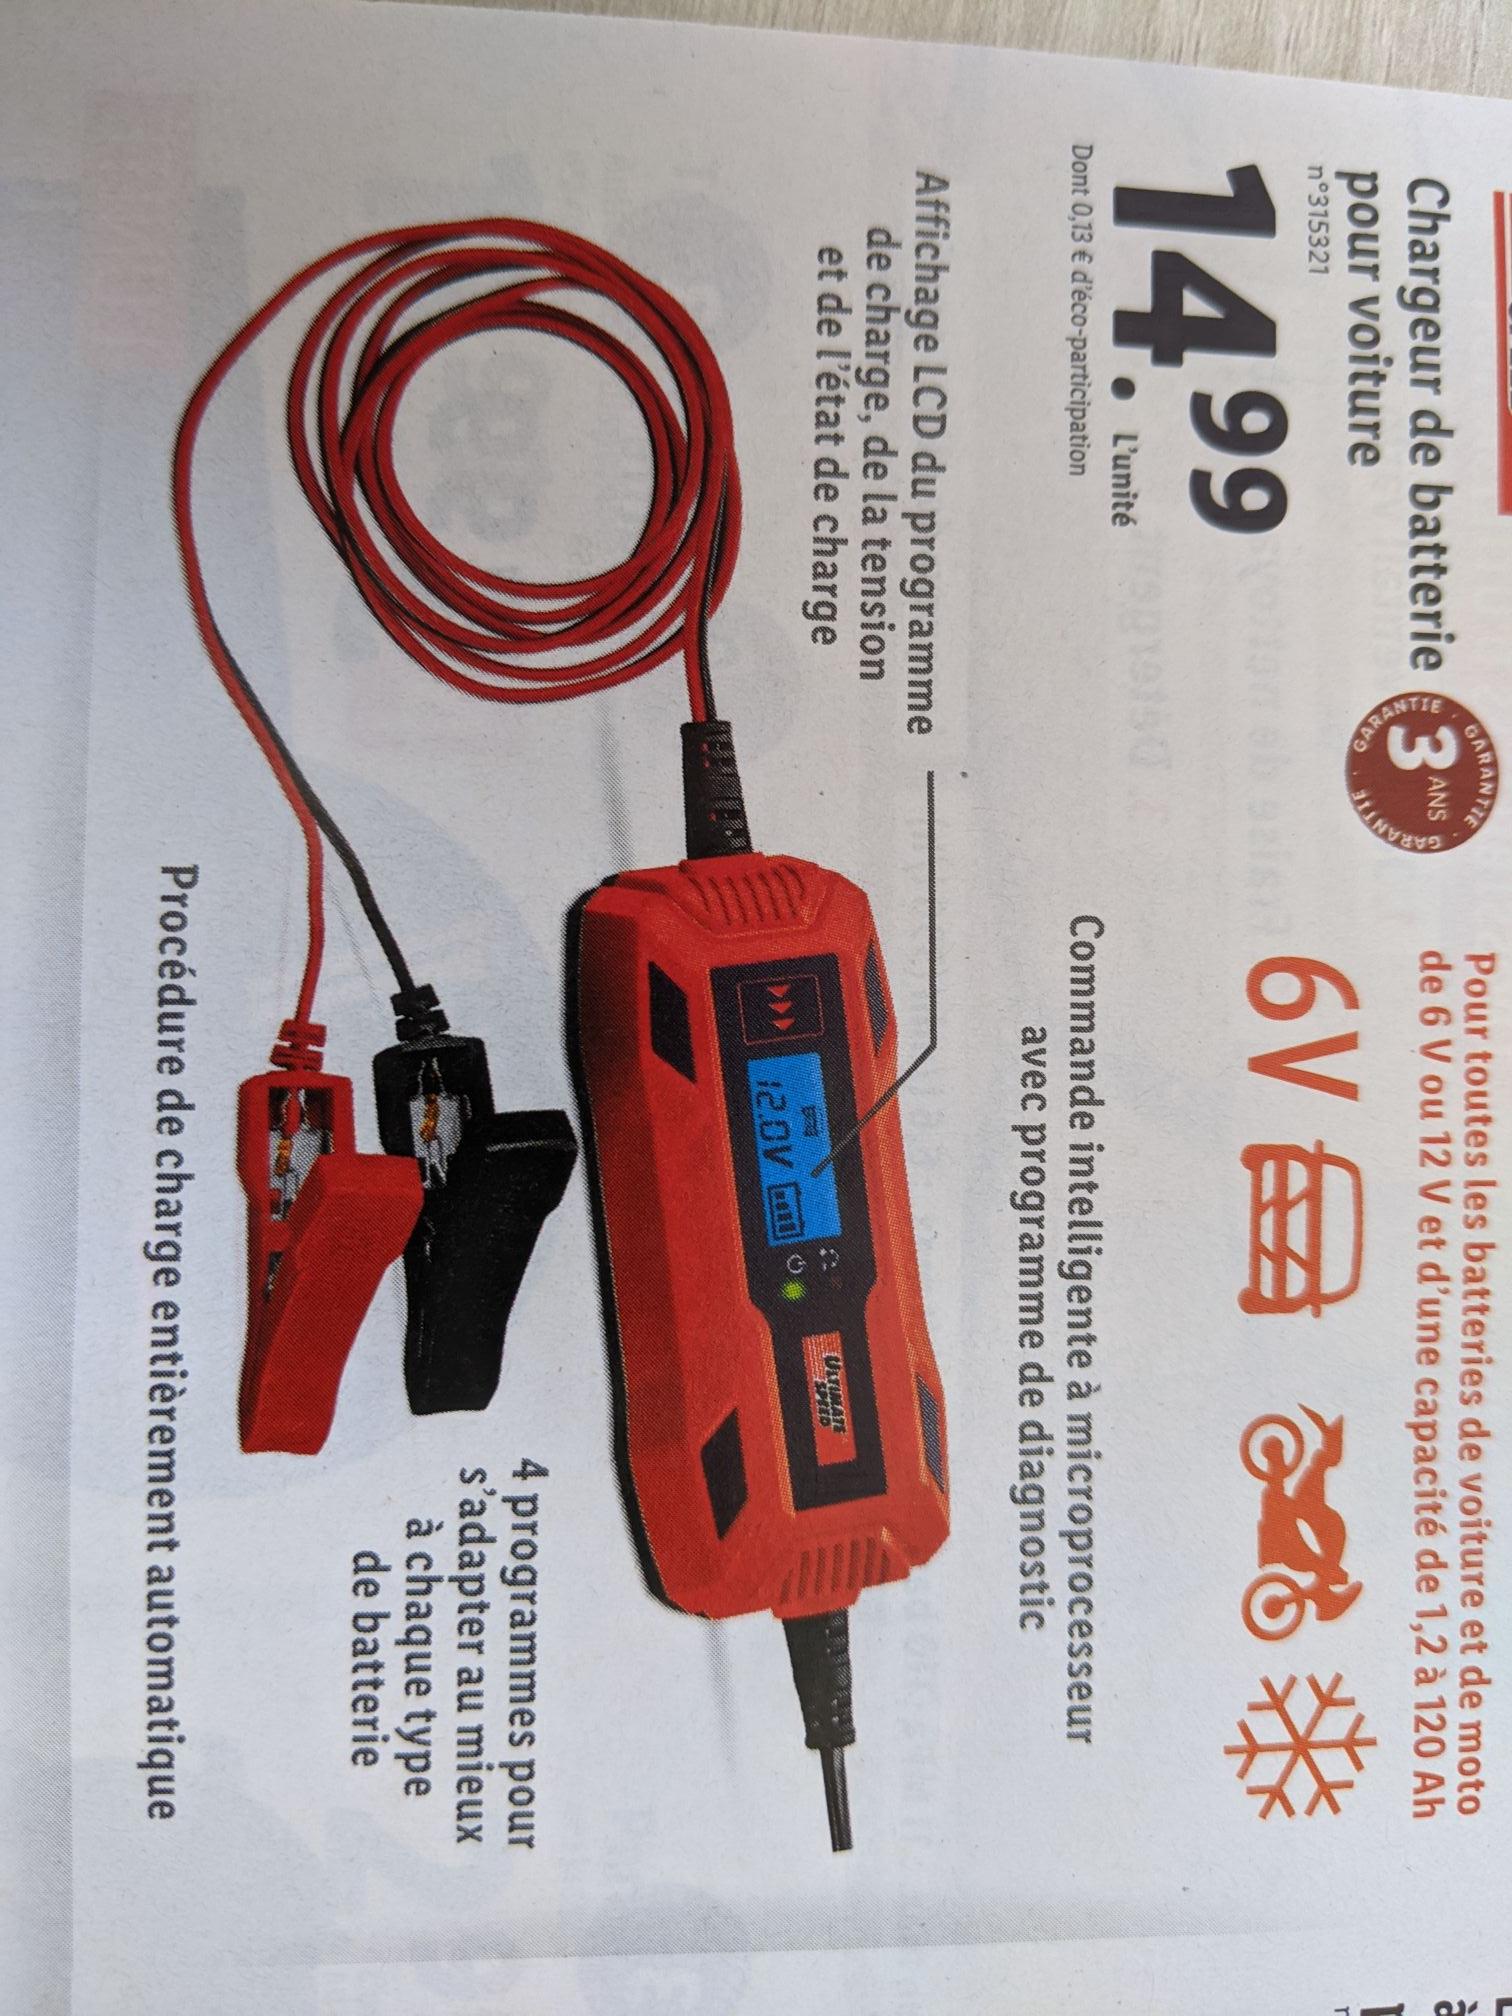 Chargeur batterie pour voiture et moto Ultimate Speed - 6 ou 12V